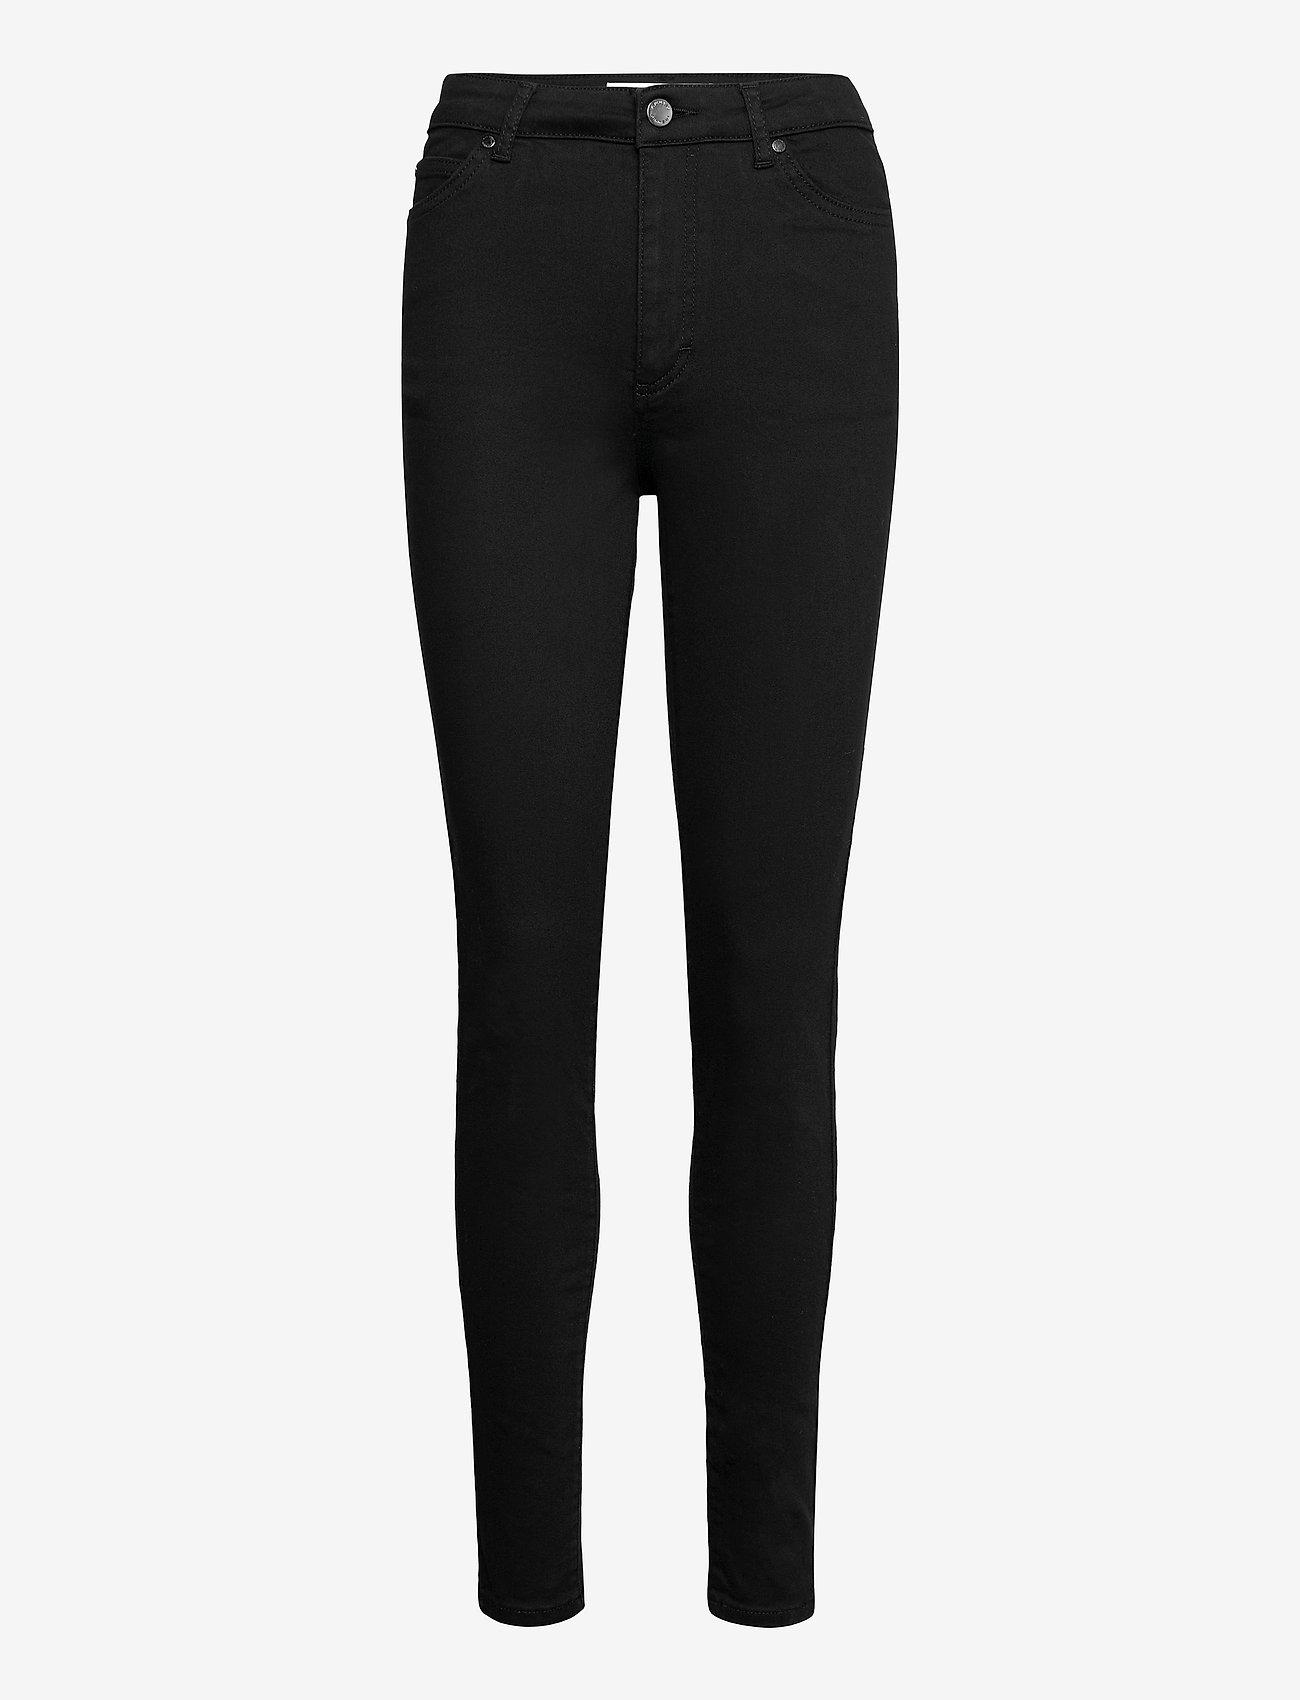 FIVEUNITS - Kate High 749 - skinny jeans - black - 0